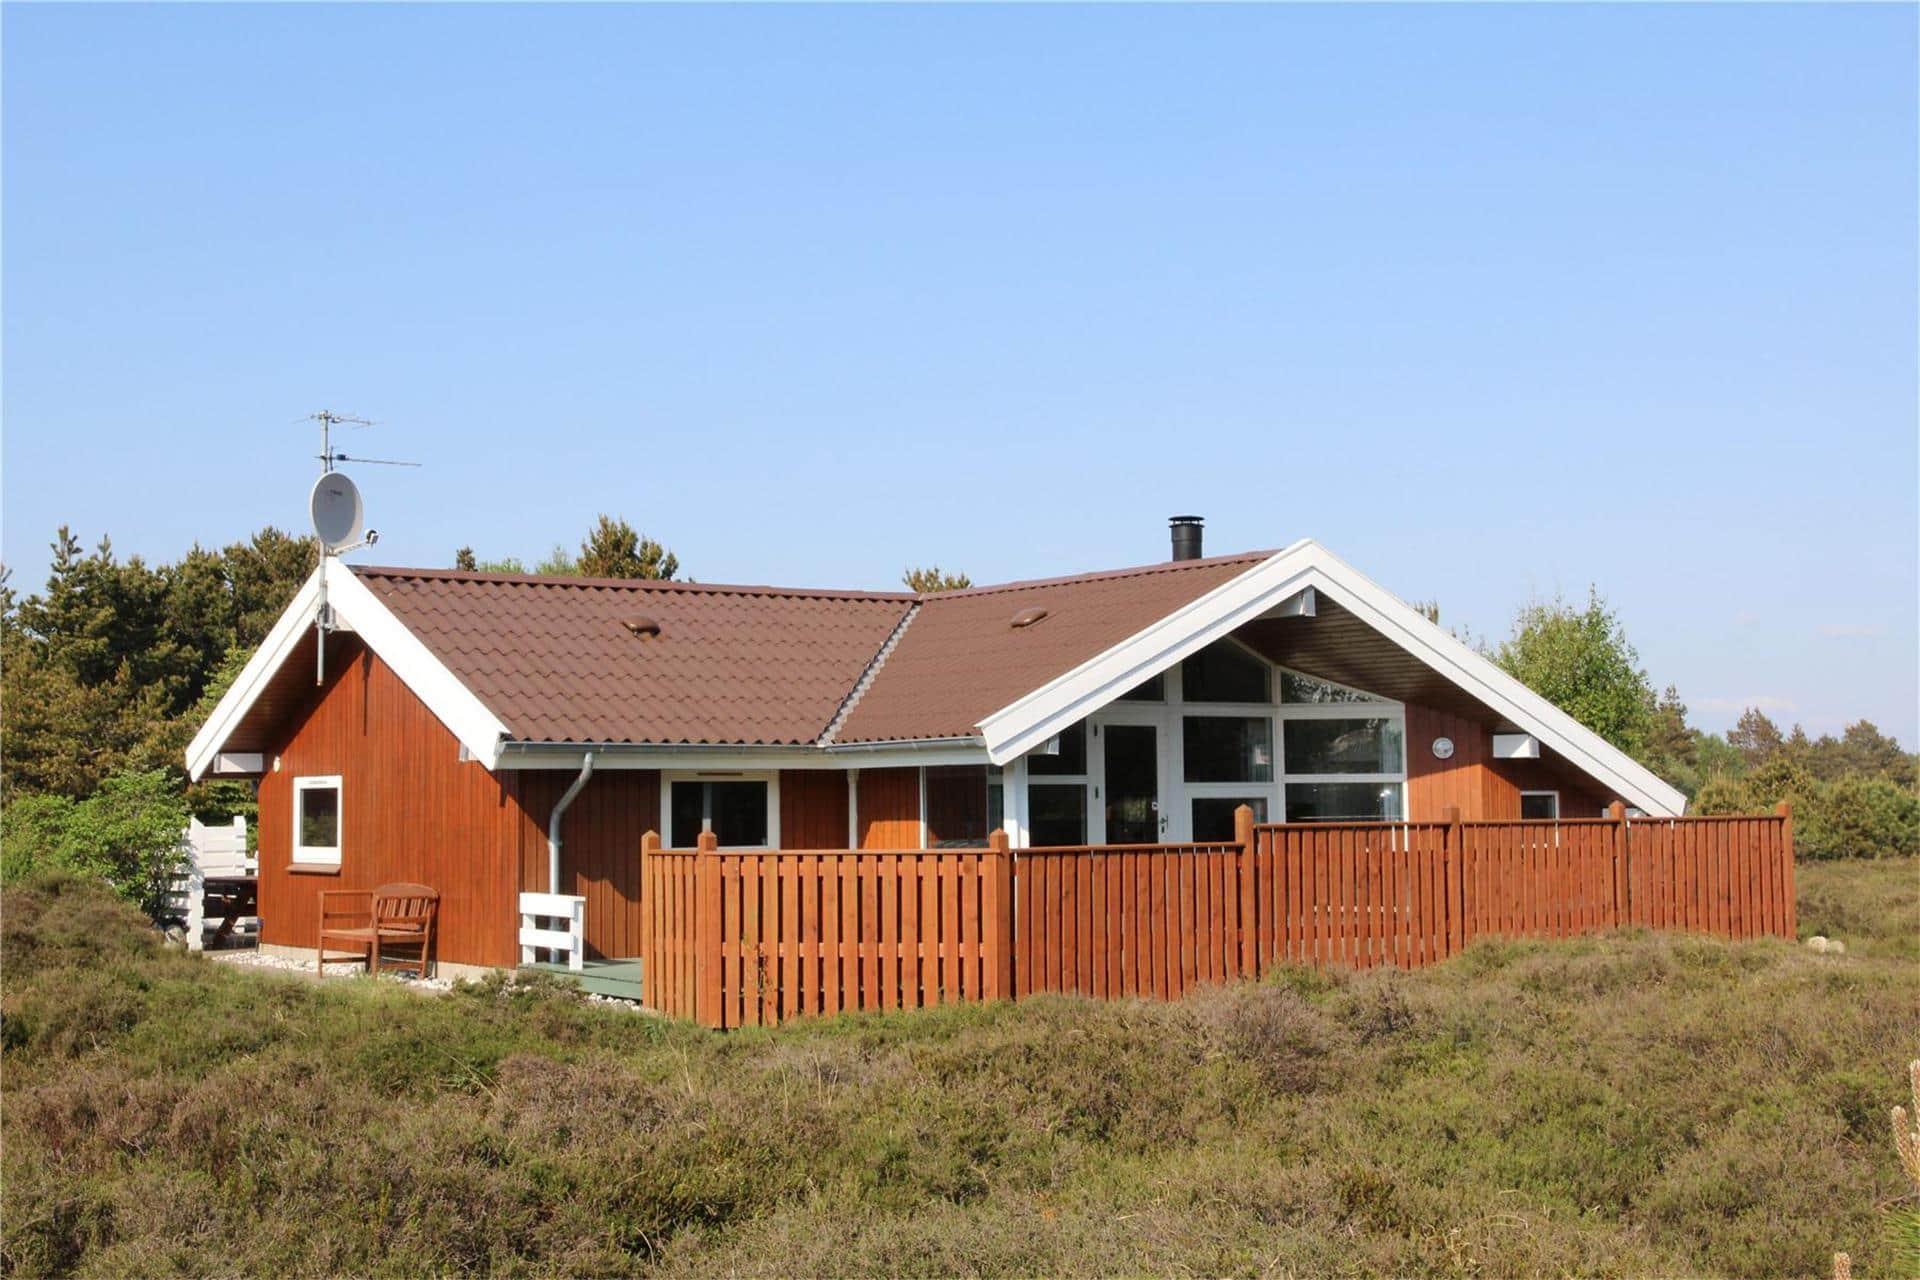 Bild 1-11 Ferienhaus 0184, Egedesminde 6, DK - 6792 Rømø